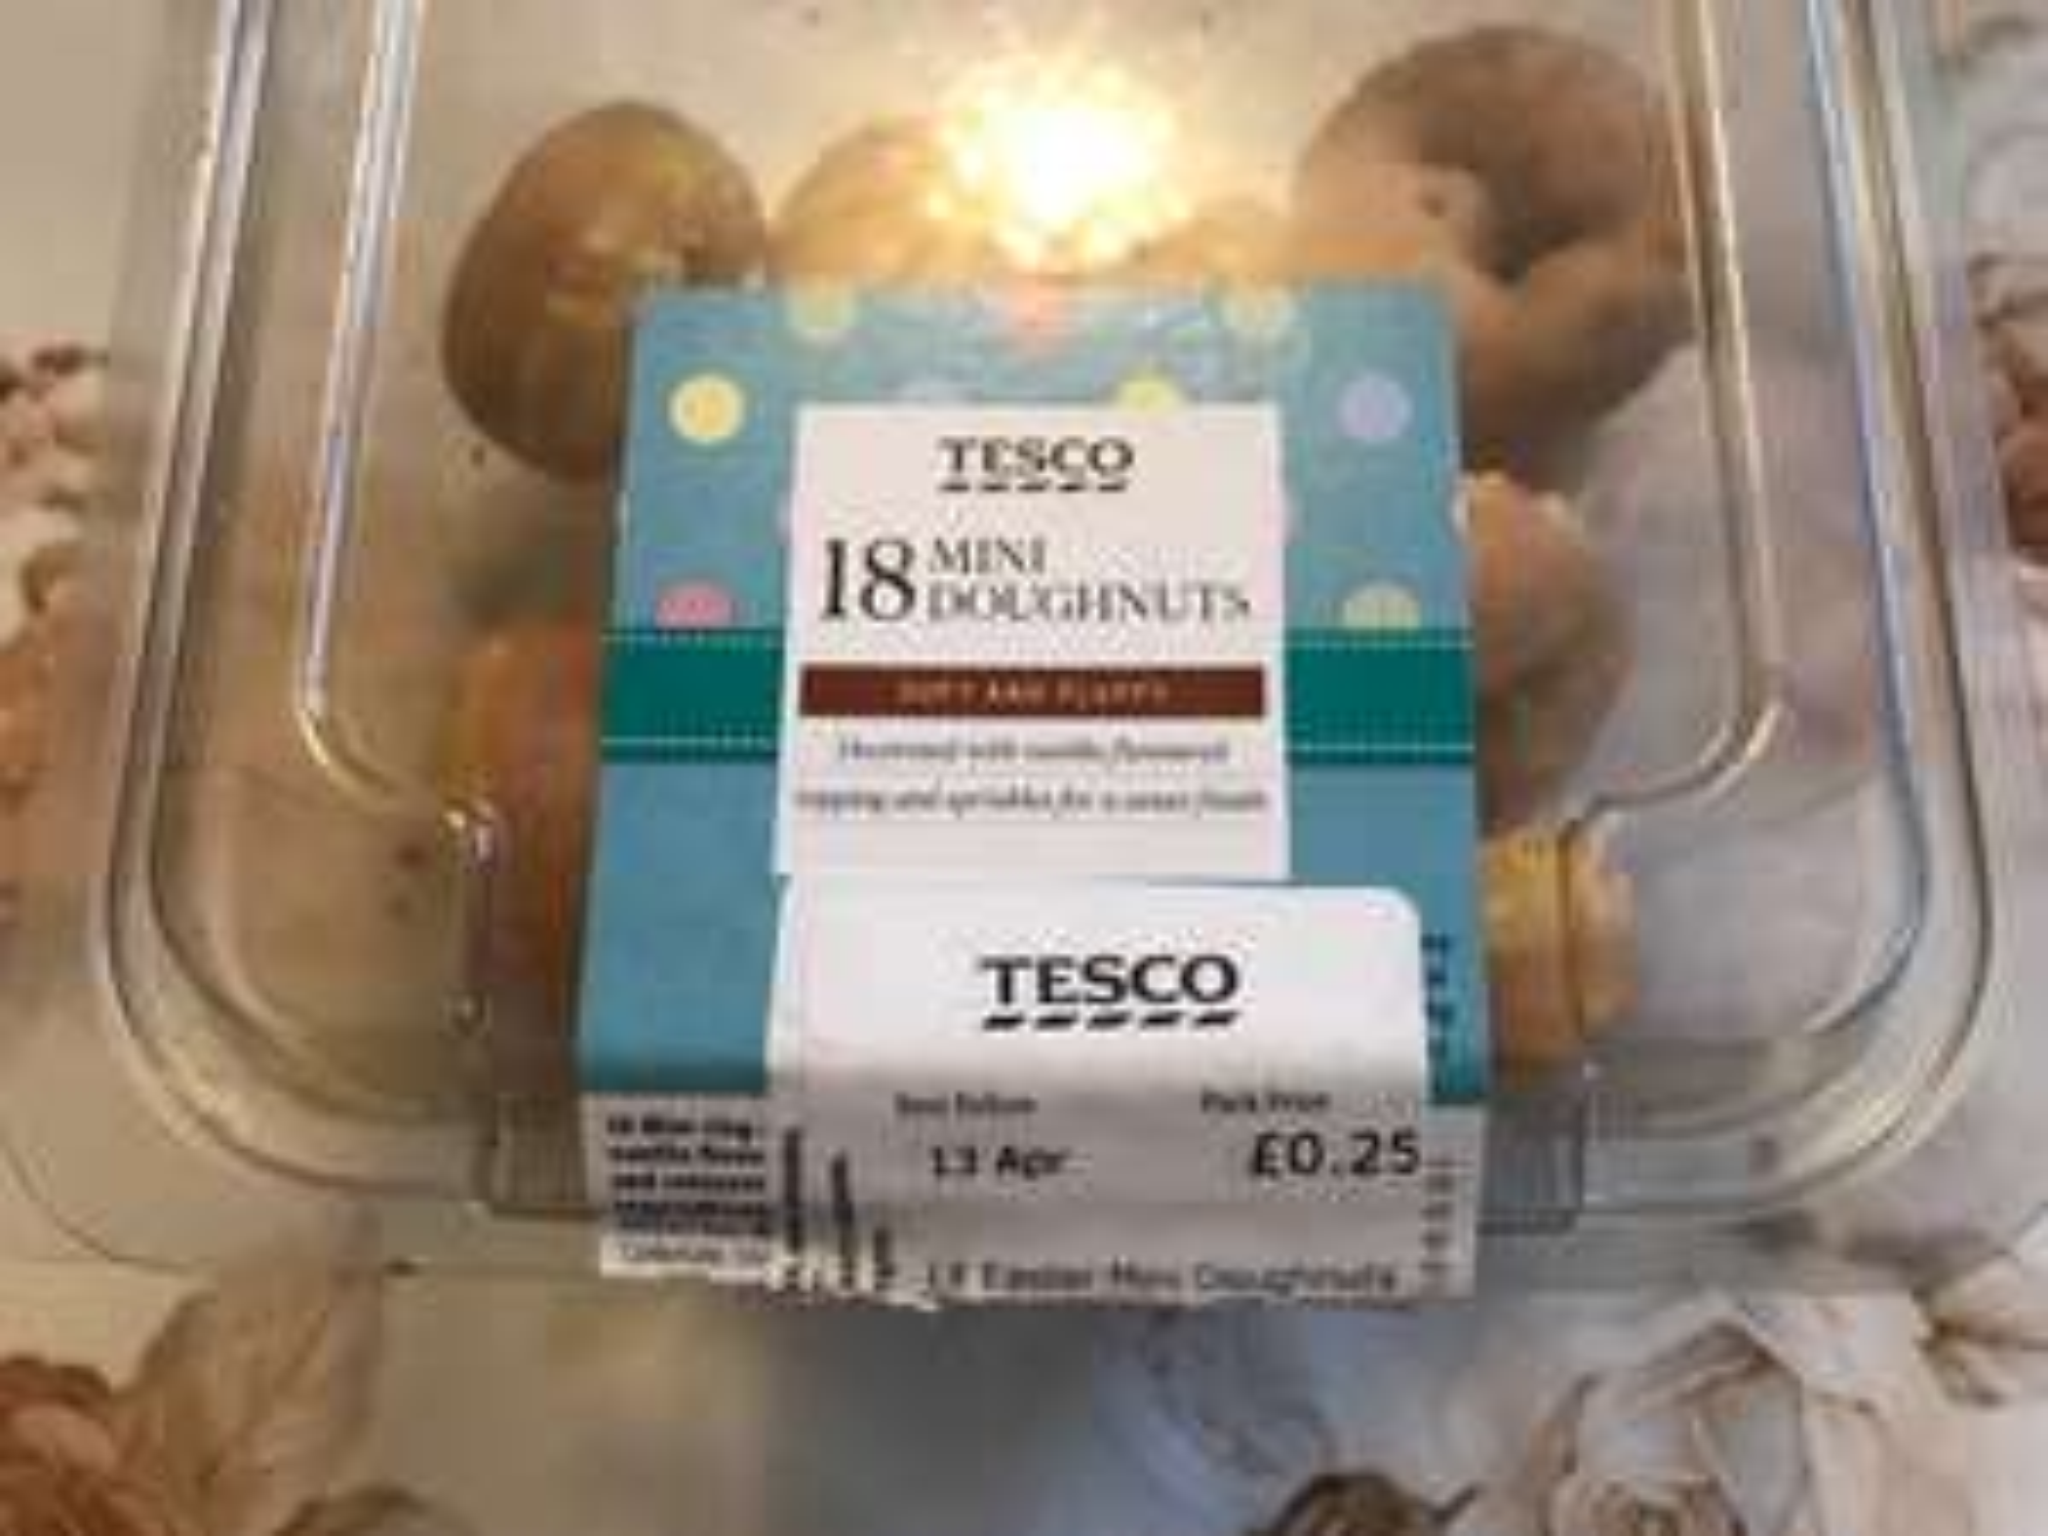 18 Mini Doughnuts for 25p at Tesco instore